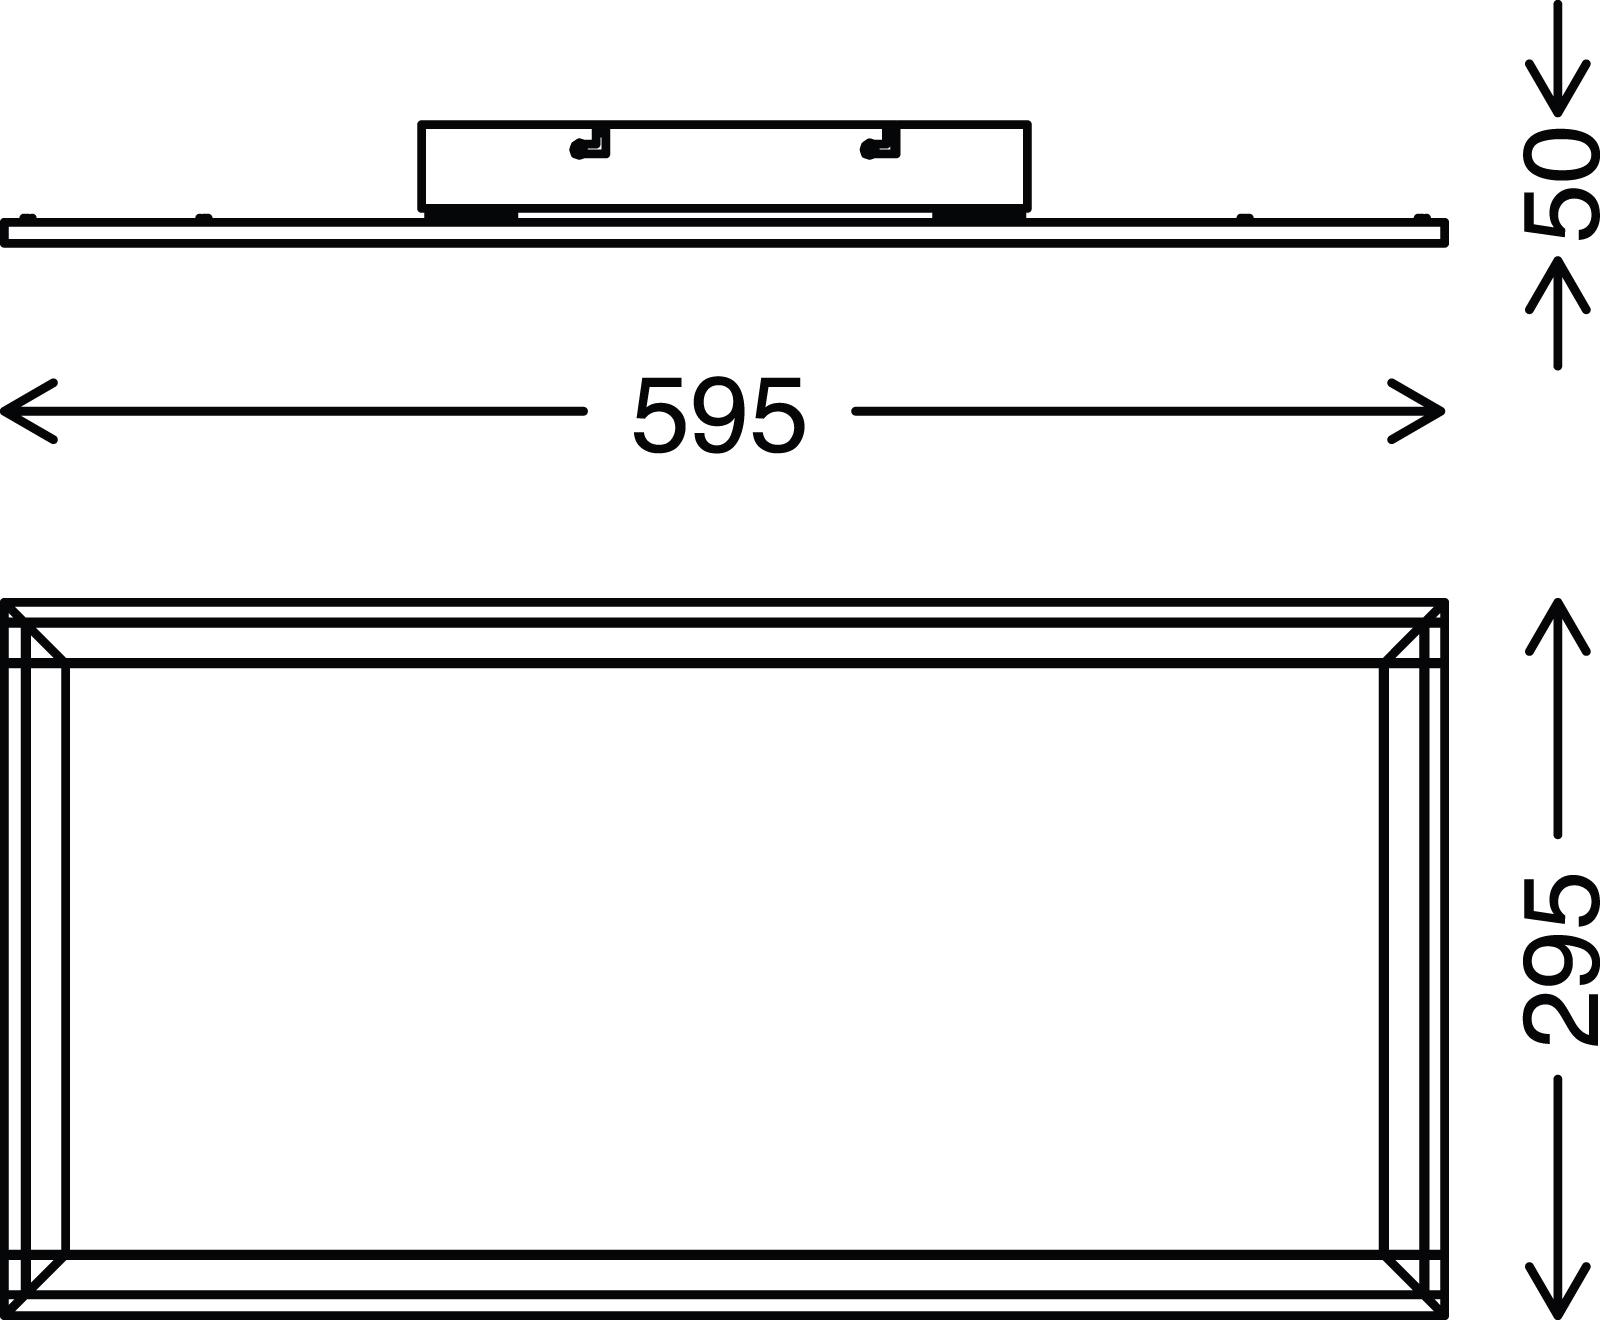 TELEFUNKEN CCT LED Panel, 59,5 cm, 36 W, Weiß